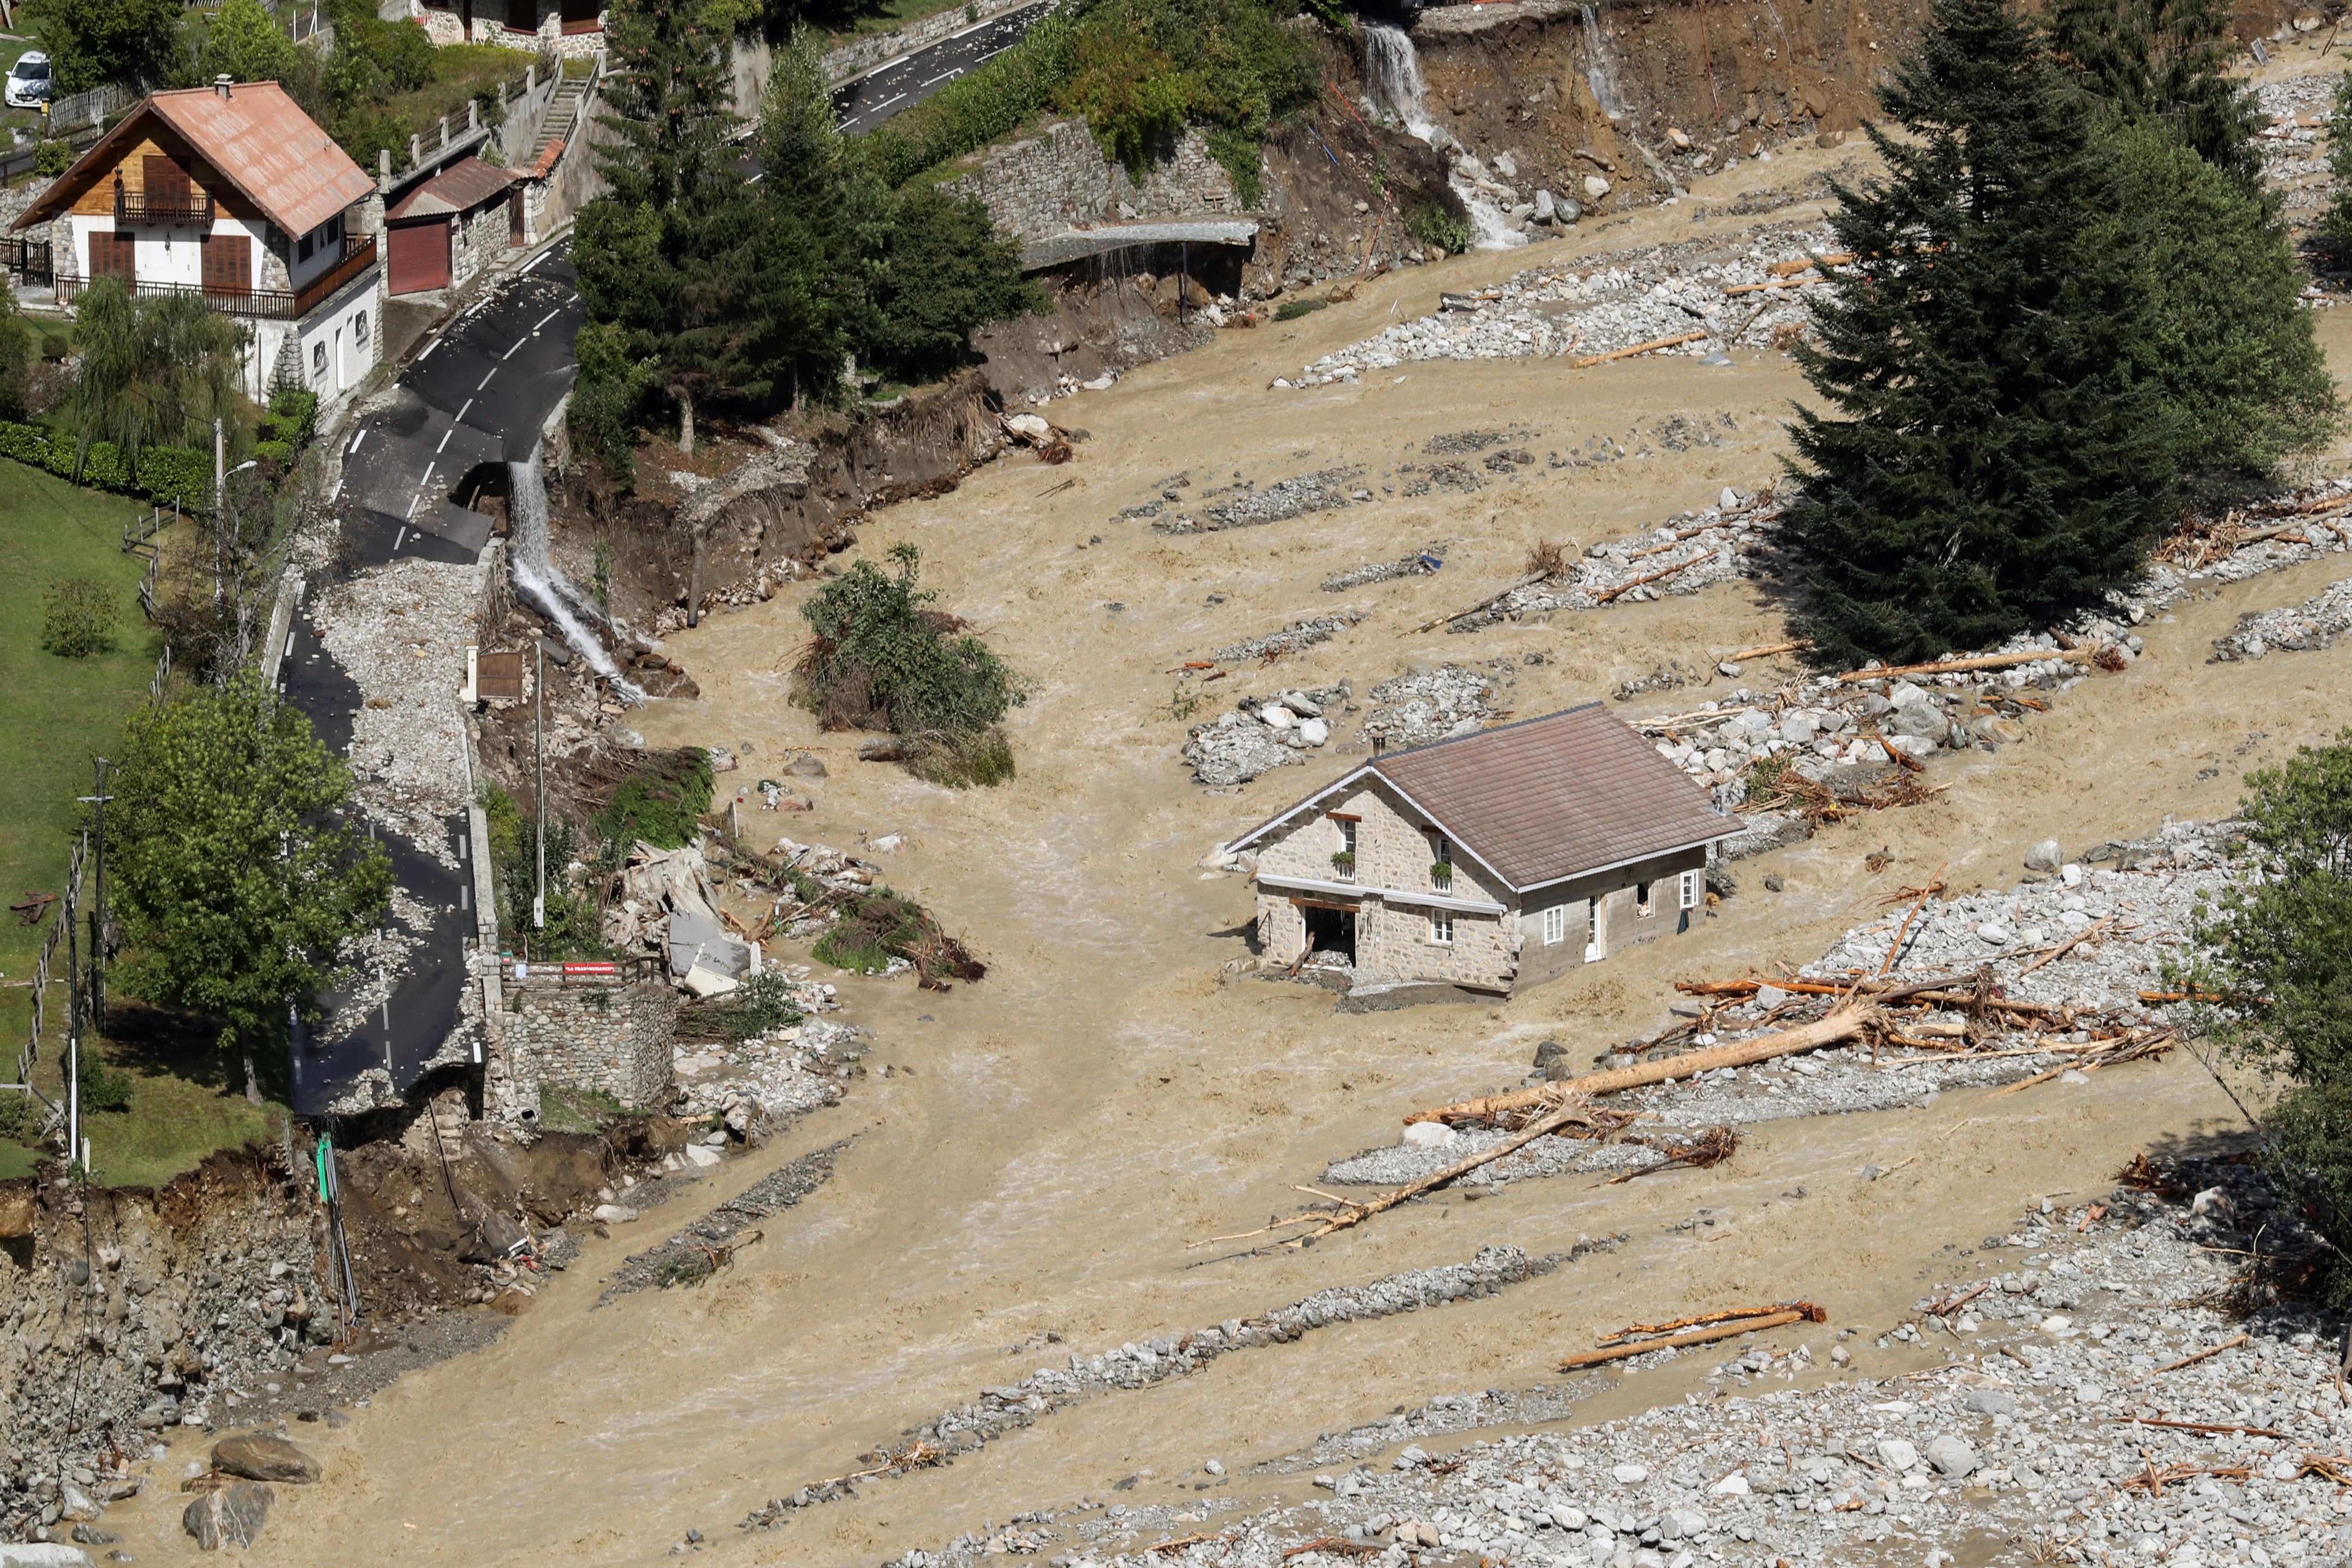 Deadly floods hit France, Italy